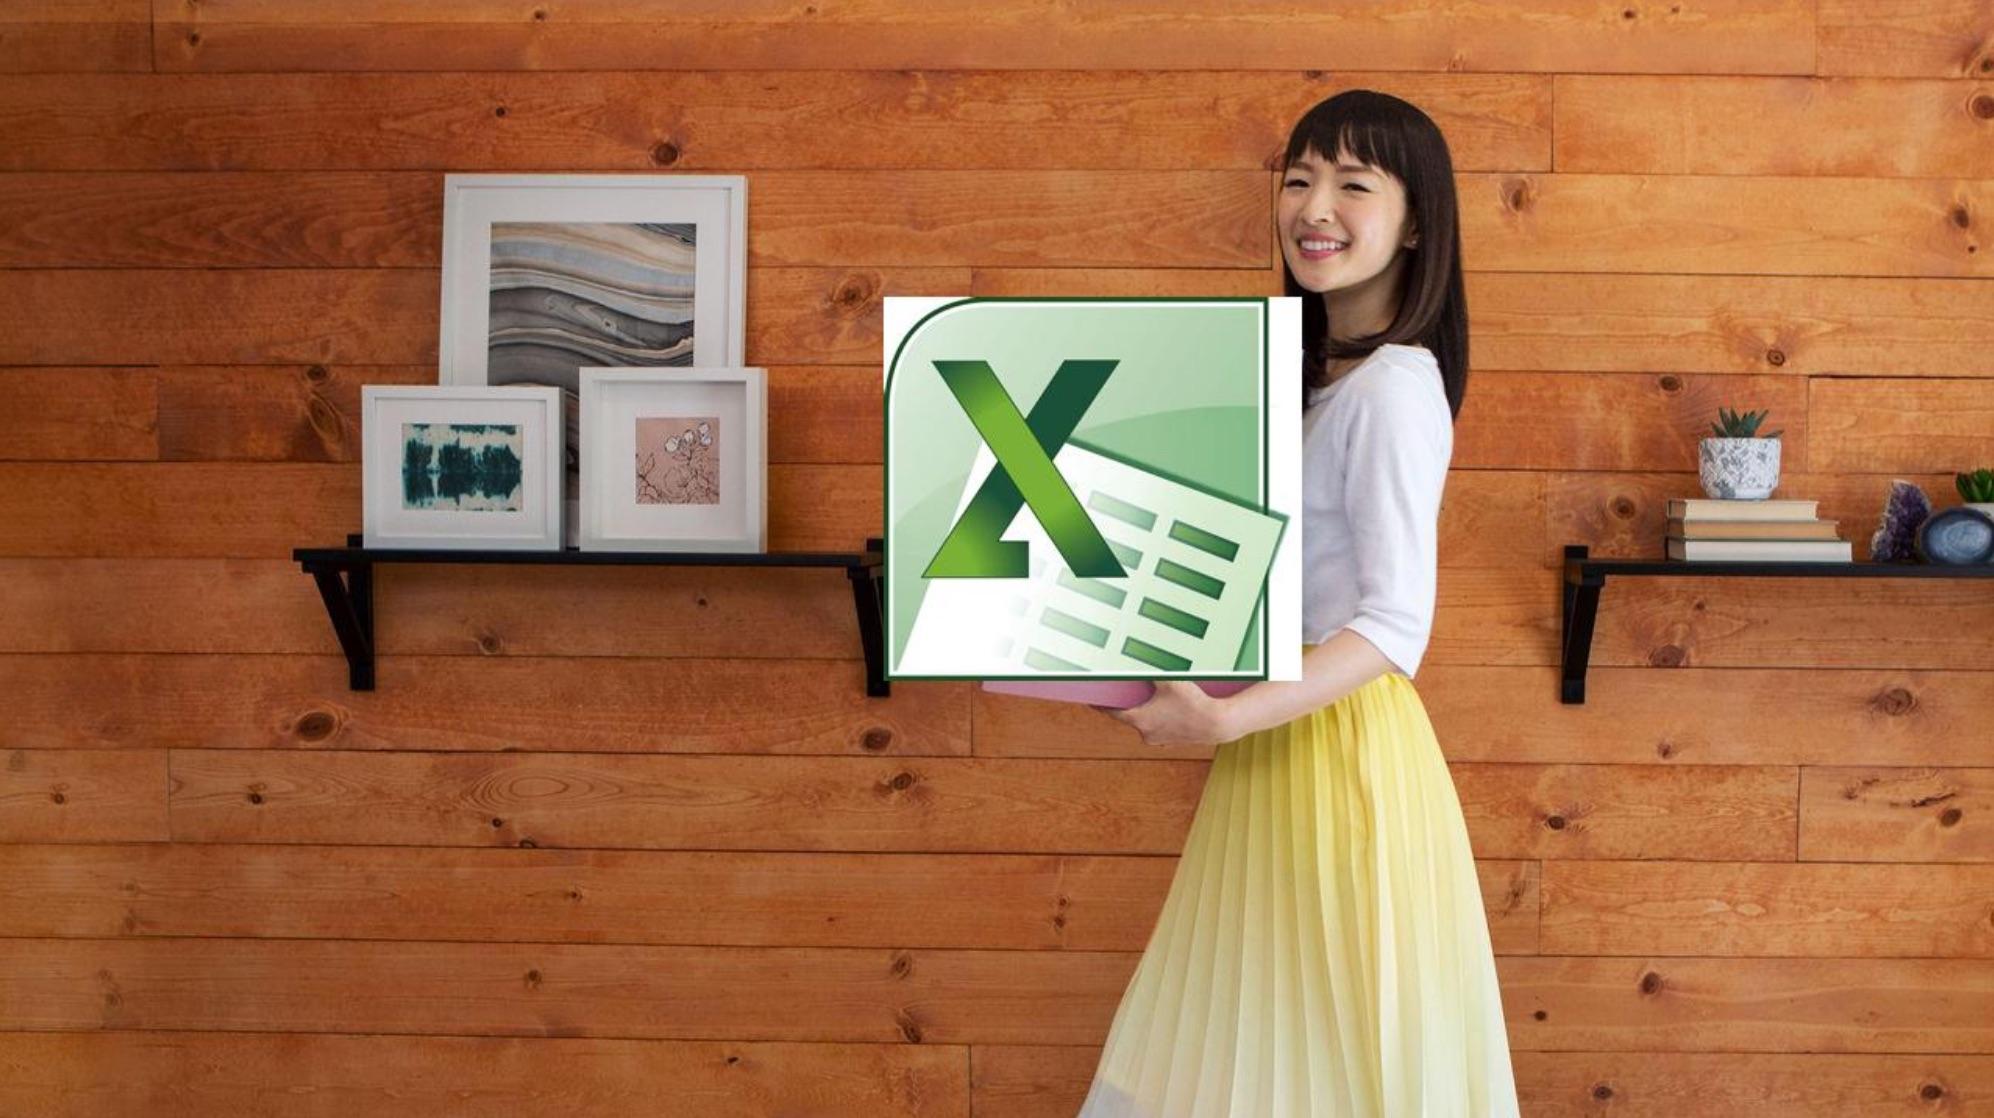 Marie Kondo Cradling an Excel Spreadsheet